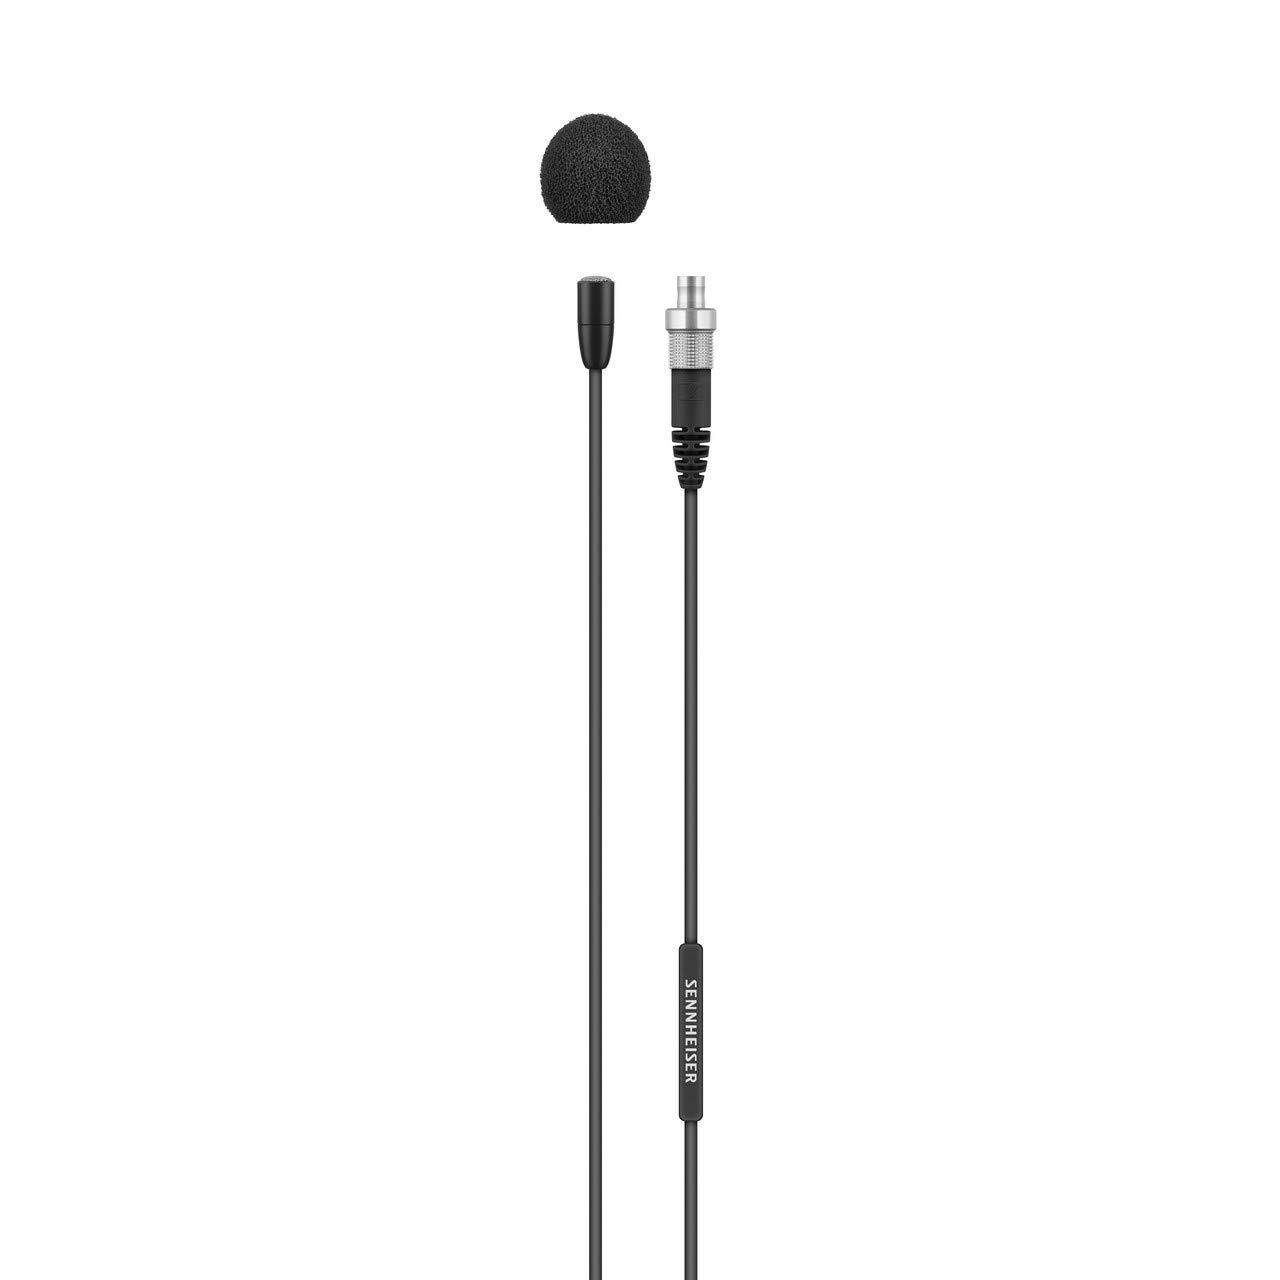 Microfono Sennheiser Pro Audio Vocal Condenser  Black 3-PIN